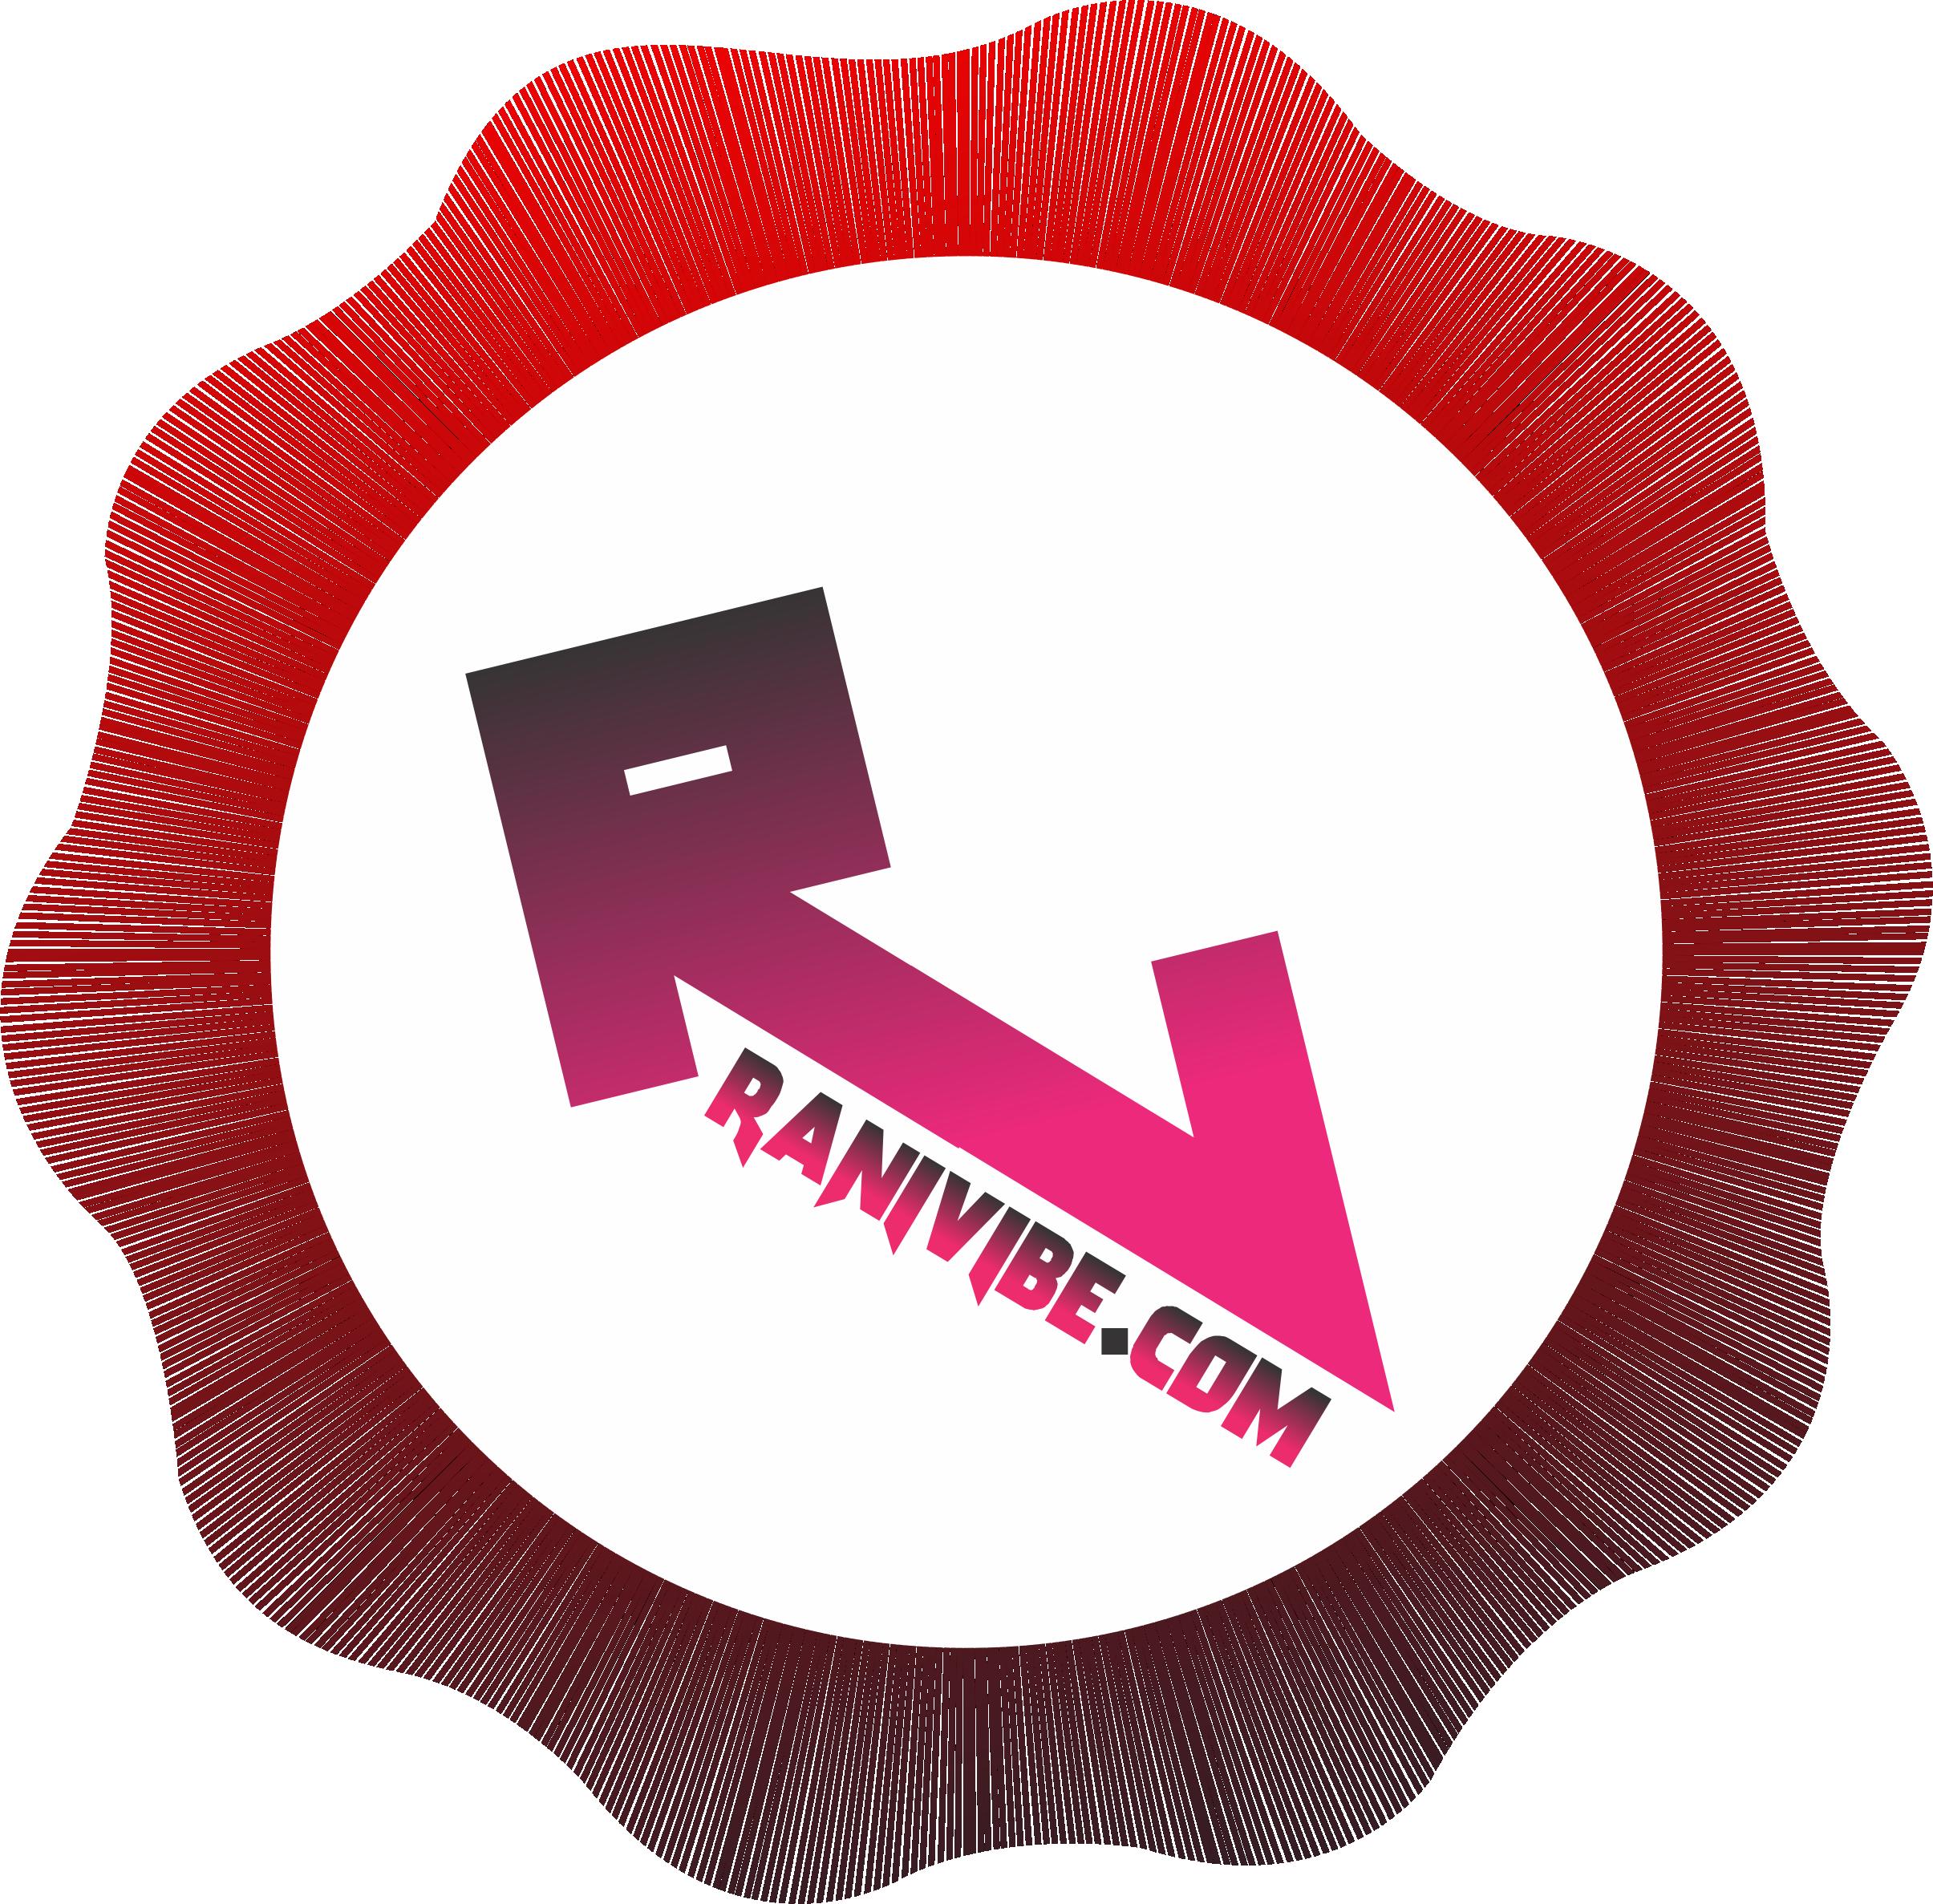 Ranivibe Media Service